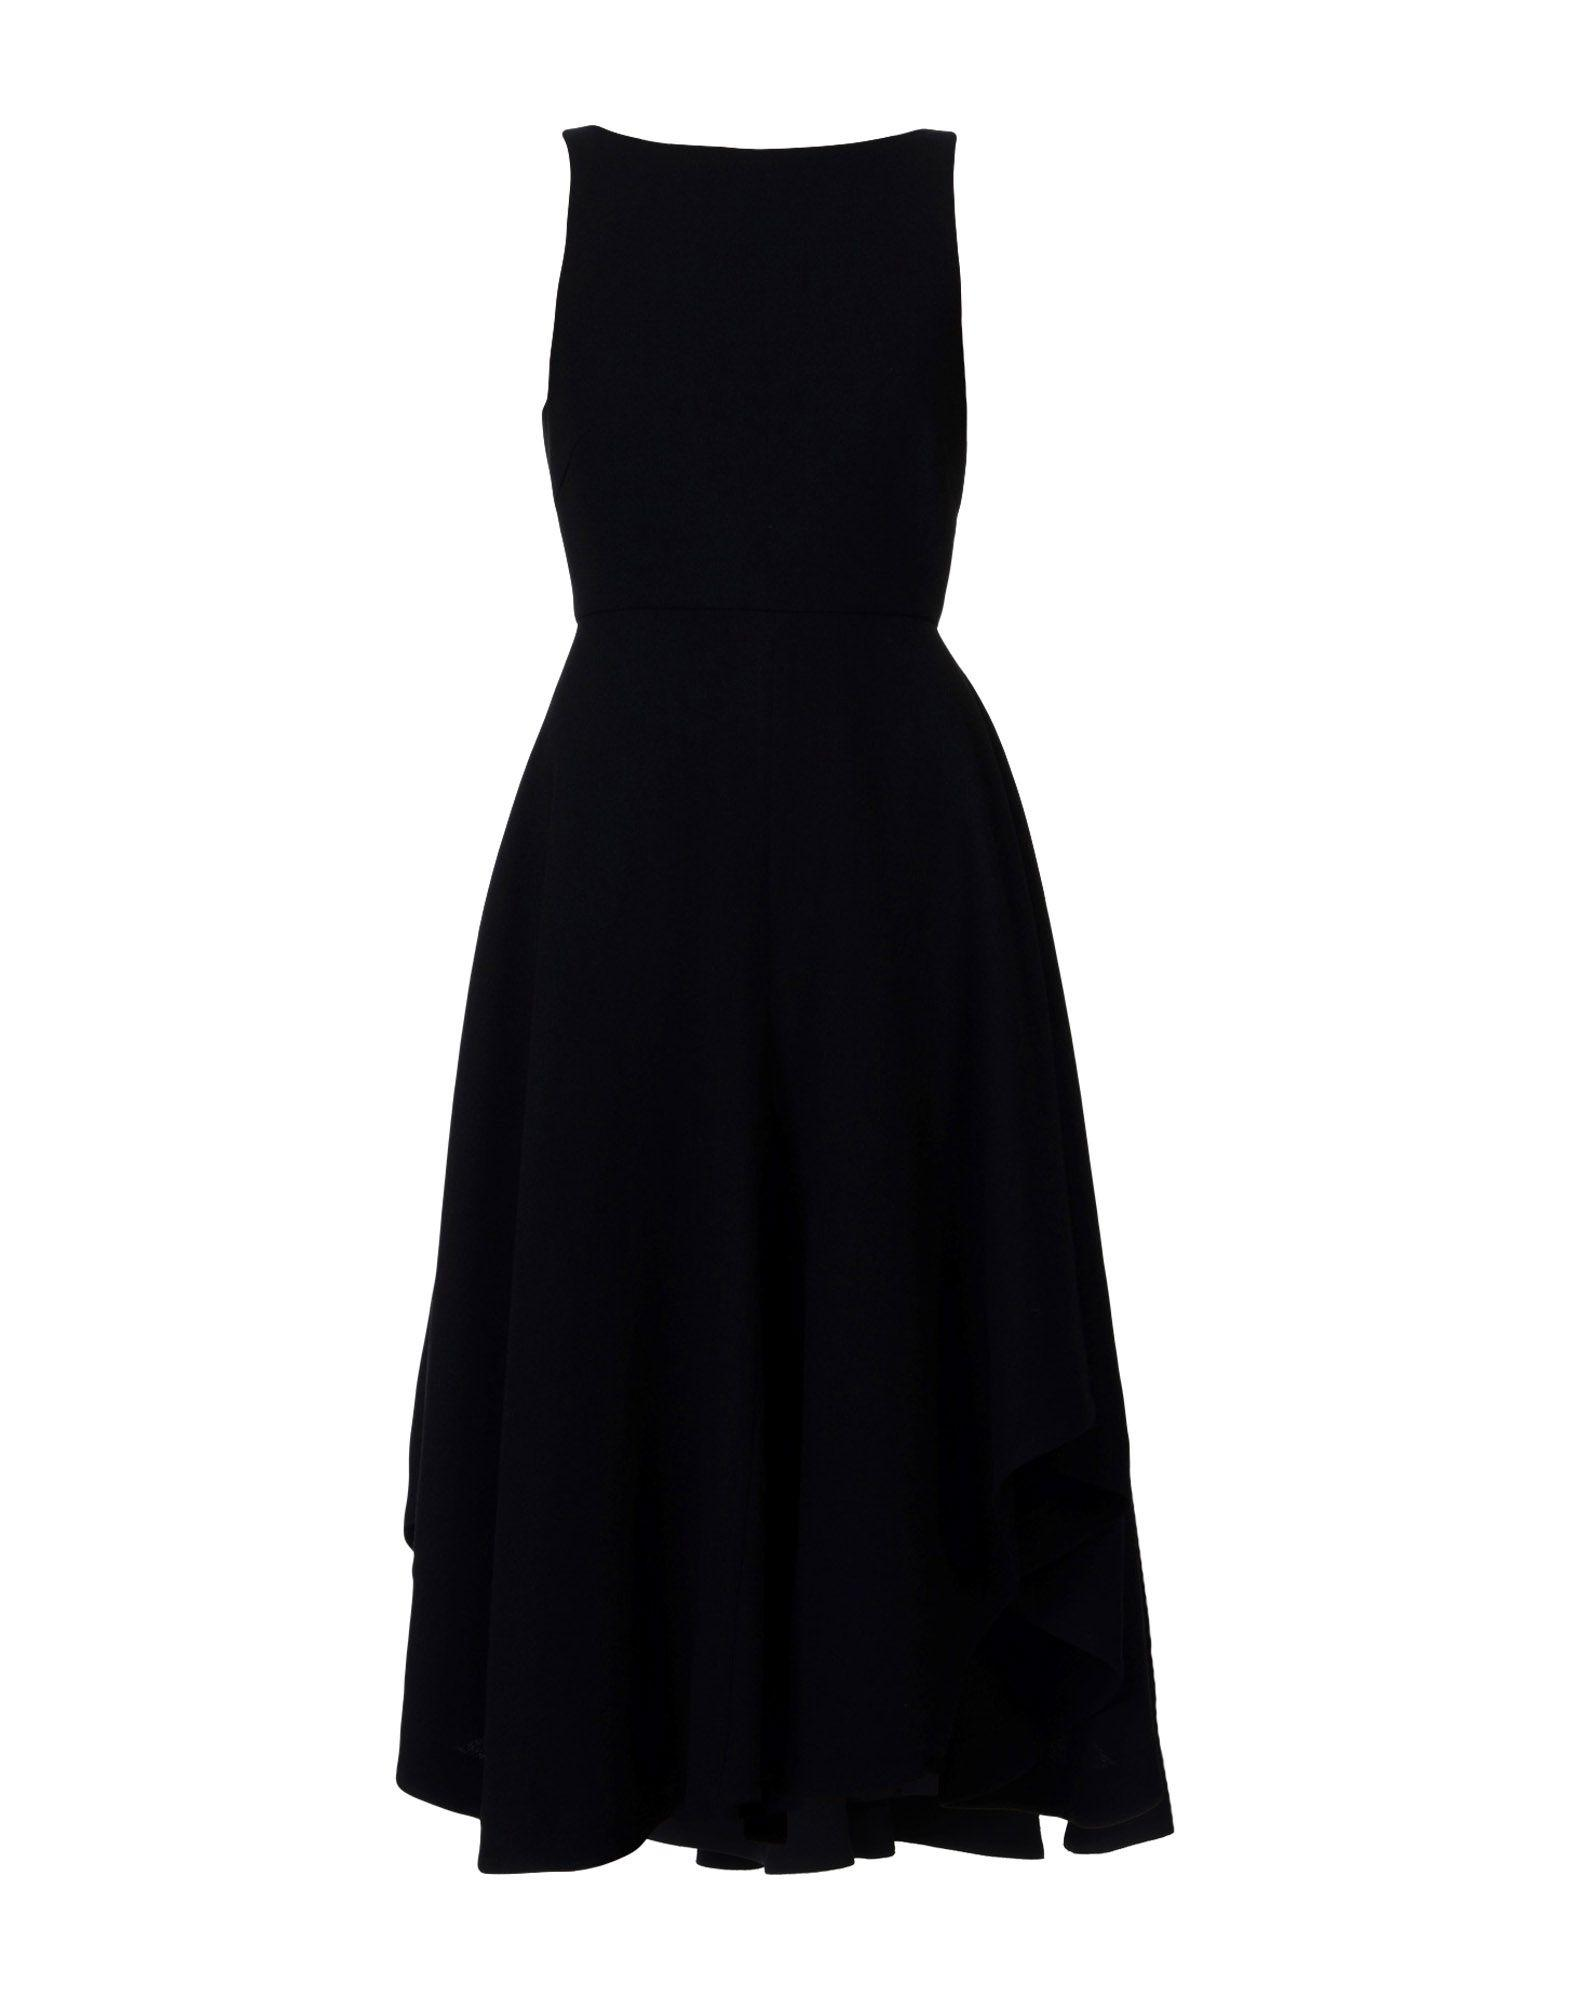 DRESSES - 3/4 length dresses Enfold 4rV1ssau